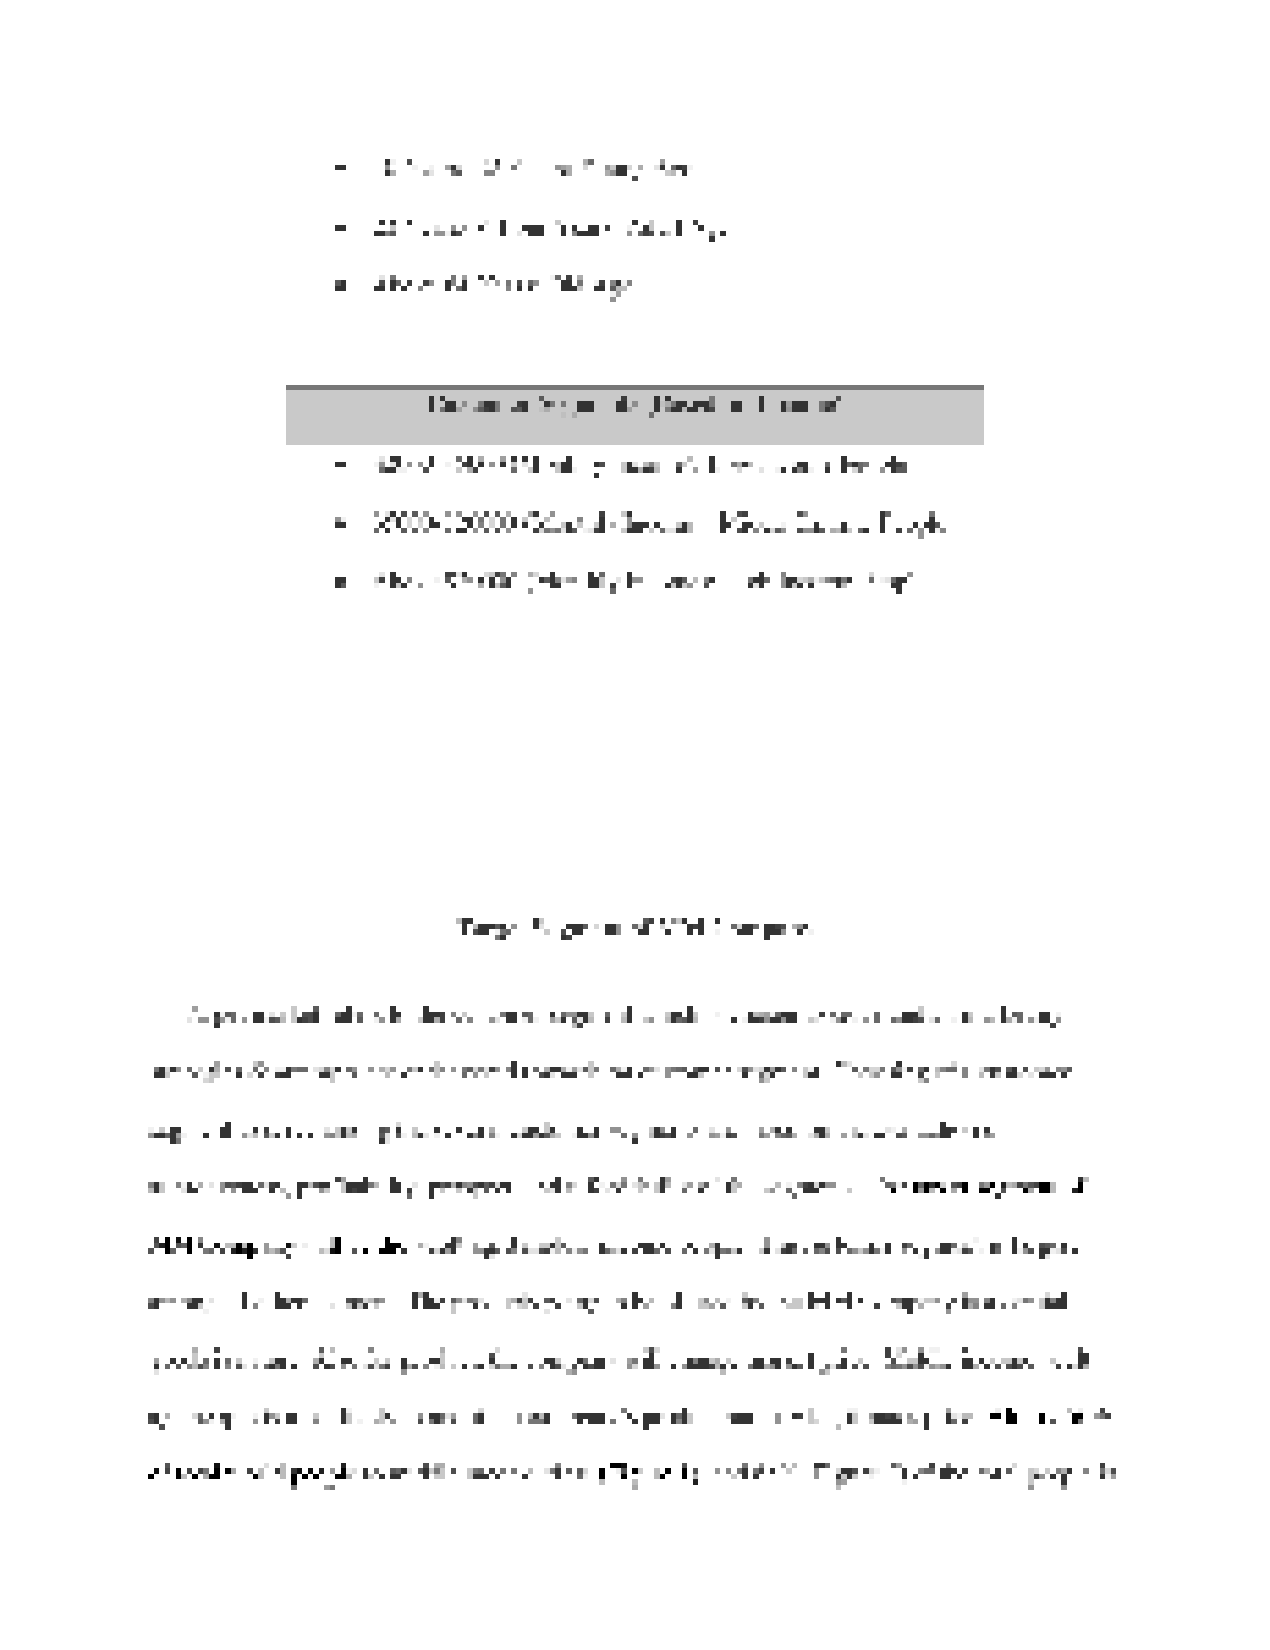 mktg 205 unit 4 ip principles Unit 41 notes seven principles of the constitution principles of the constitution - civics state exam - продолжительность: 10:56 mr raymond's civics and social studies academy 9 218 просмотров.